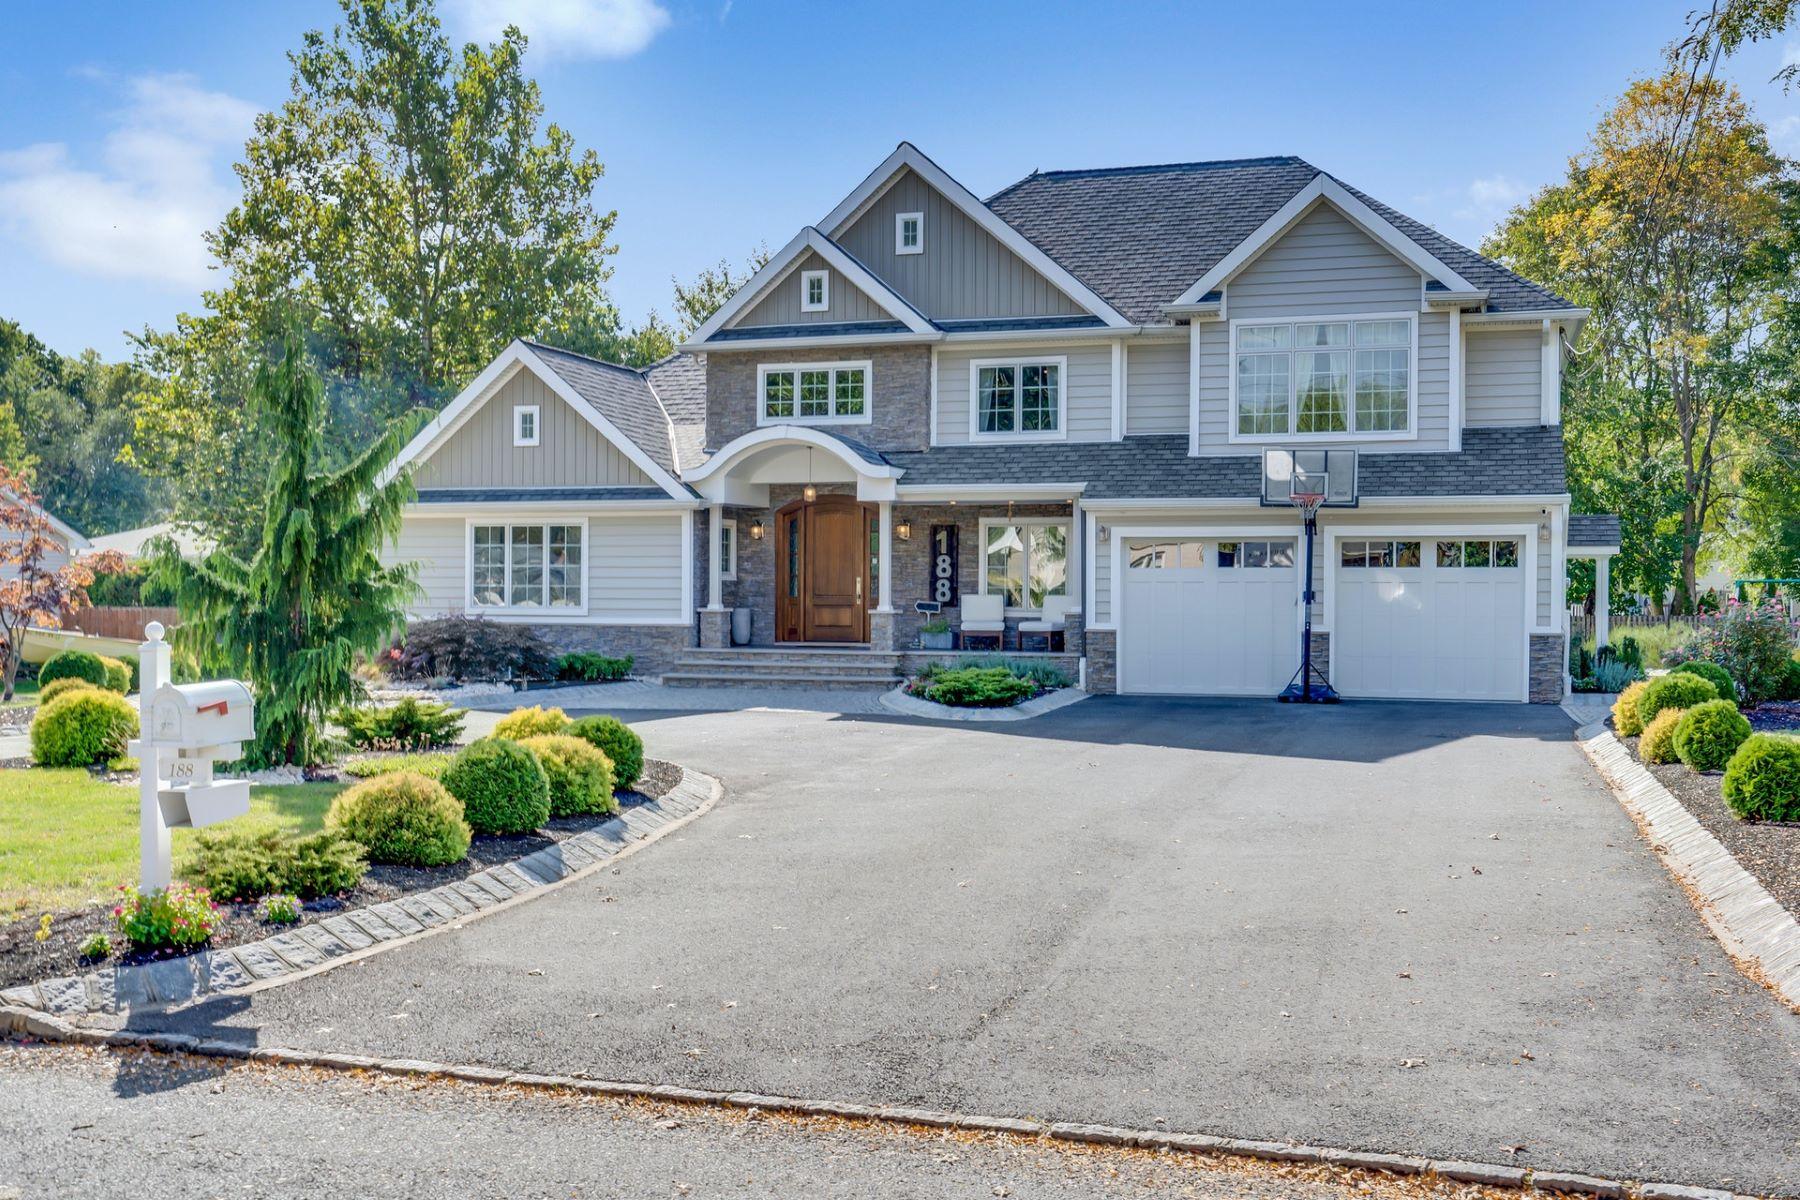 Single Family Homes للـ Sale في LUXURY, LIFESTYLE, SOPHISTICATION! 188 BRIARHEATH LANE, Union Township, New Jersey 07066 United States